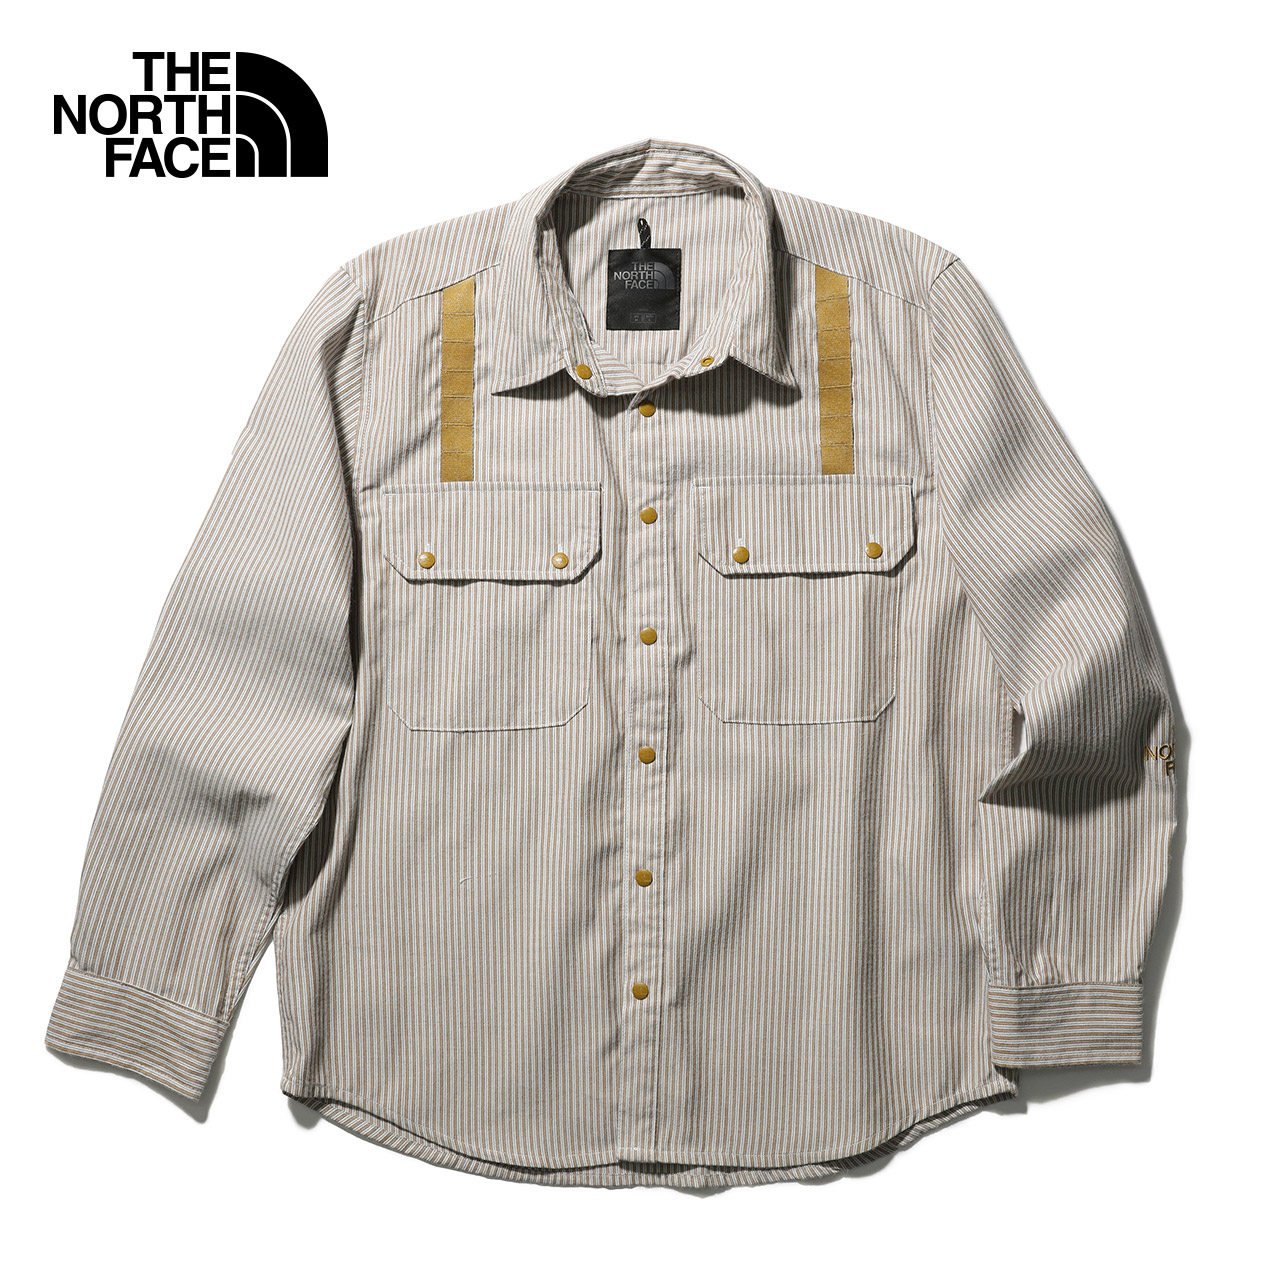 TheNorthFaceUE北面DOUBLE CARGO LS SHIRT仓石一树长袖衬衫|46DW